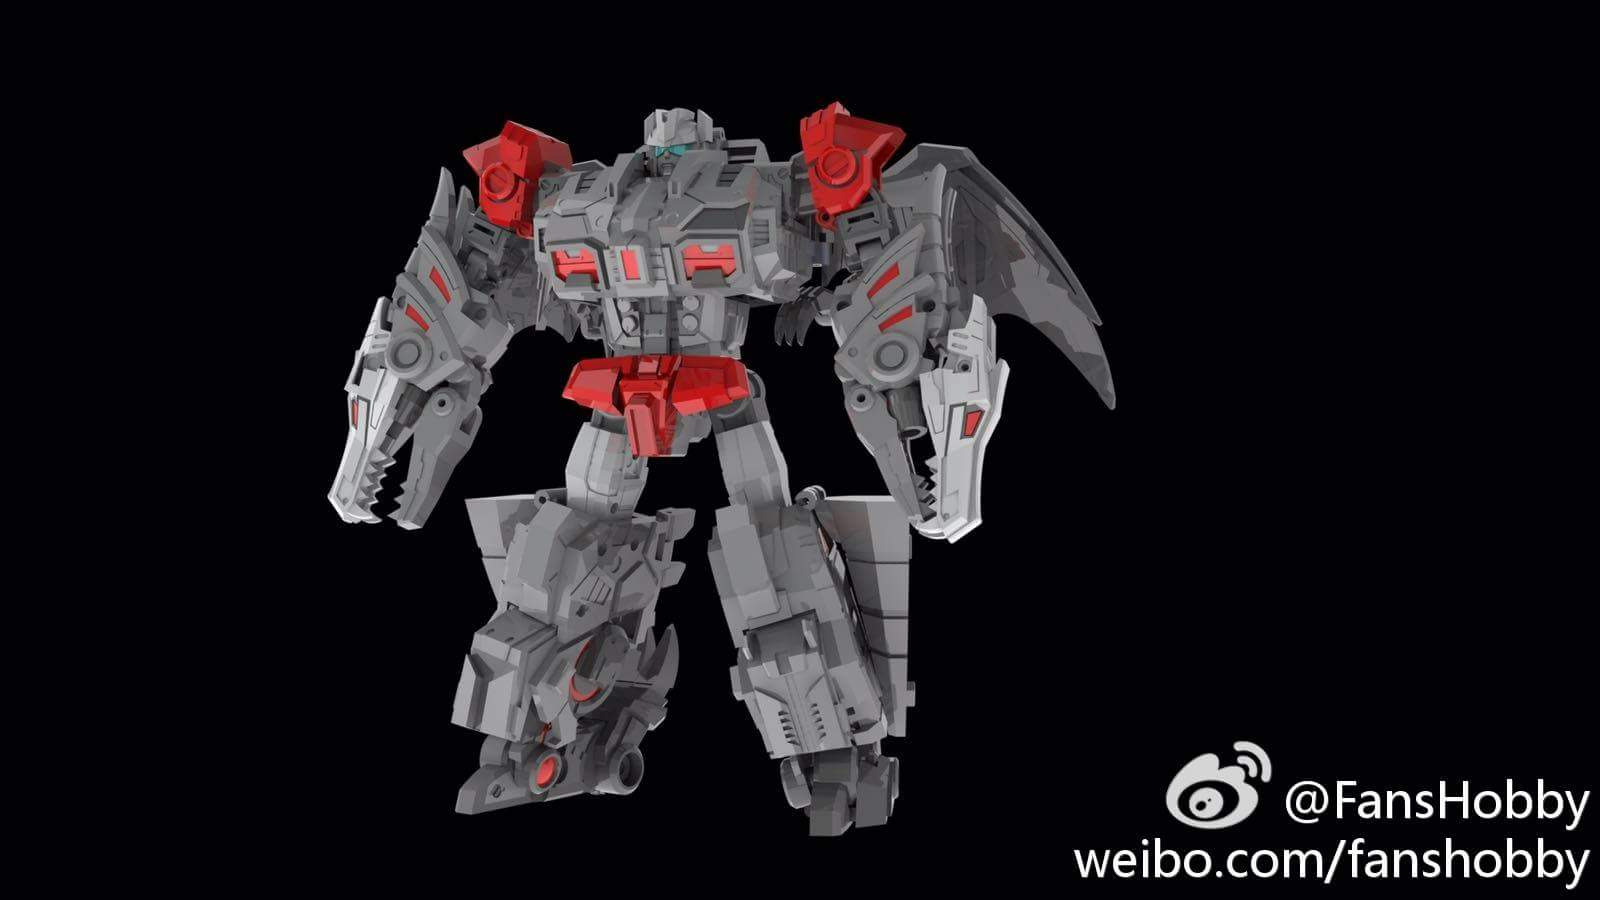 [FansHobby] Produit Tiers - Master Builder MB-02/03/05 - aka Monsterbots/Monstrebots - Page 2 QRpoYuTc